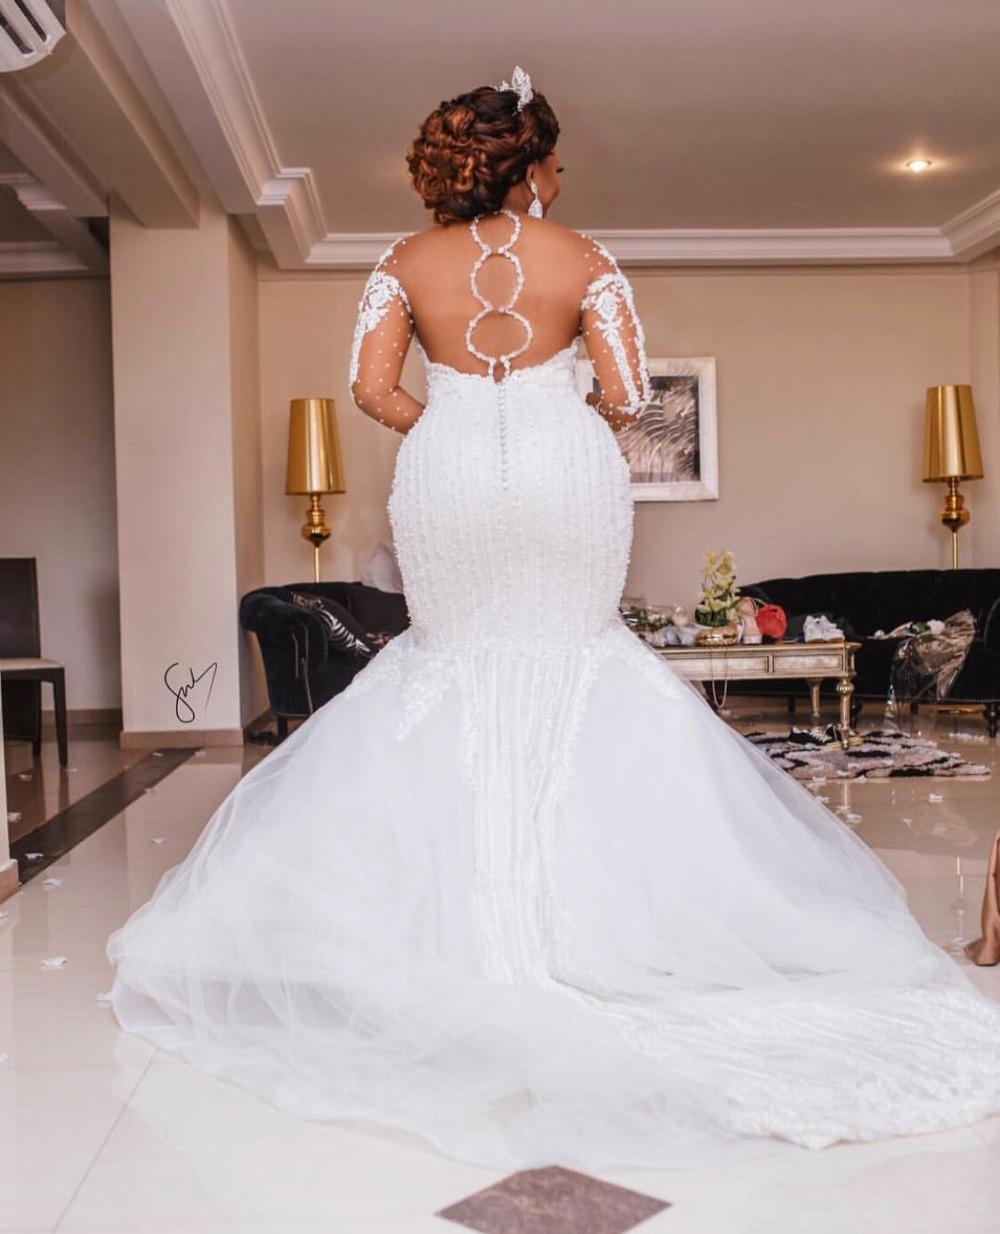 Africano de luxo beading sereia vestido de casamento manga longa apliques pérolas vestidos de casamento plus size preto noiva - 2